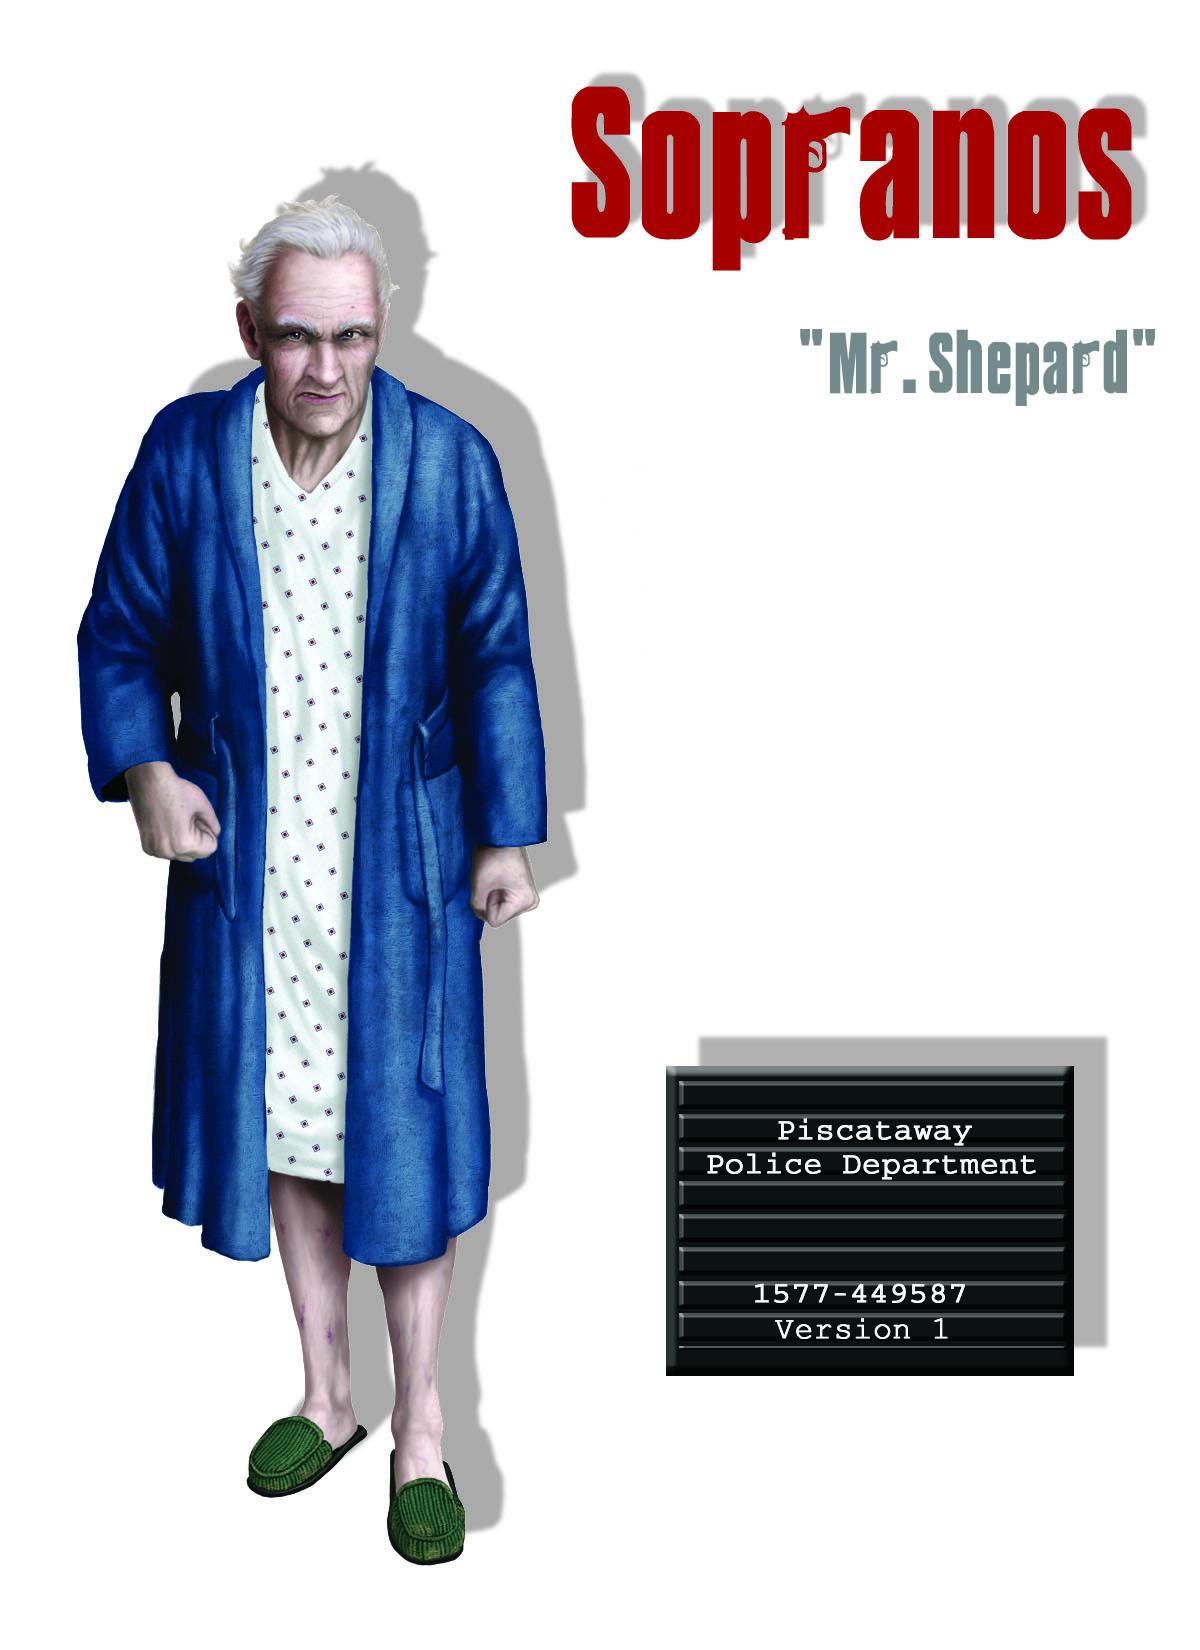 Jeff zugale mrshepard concept